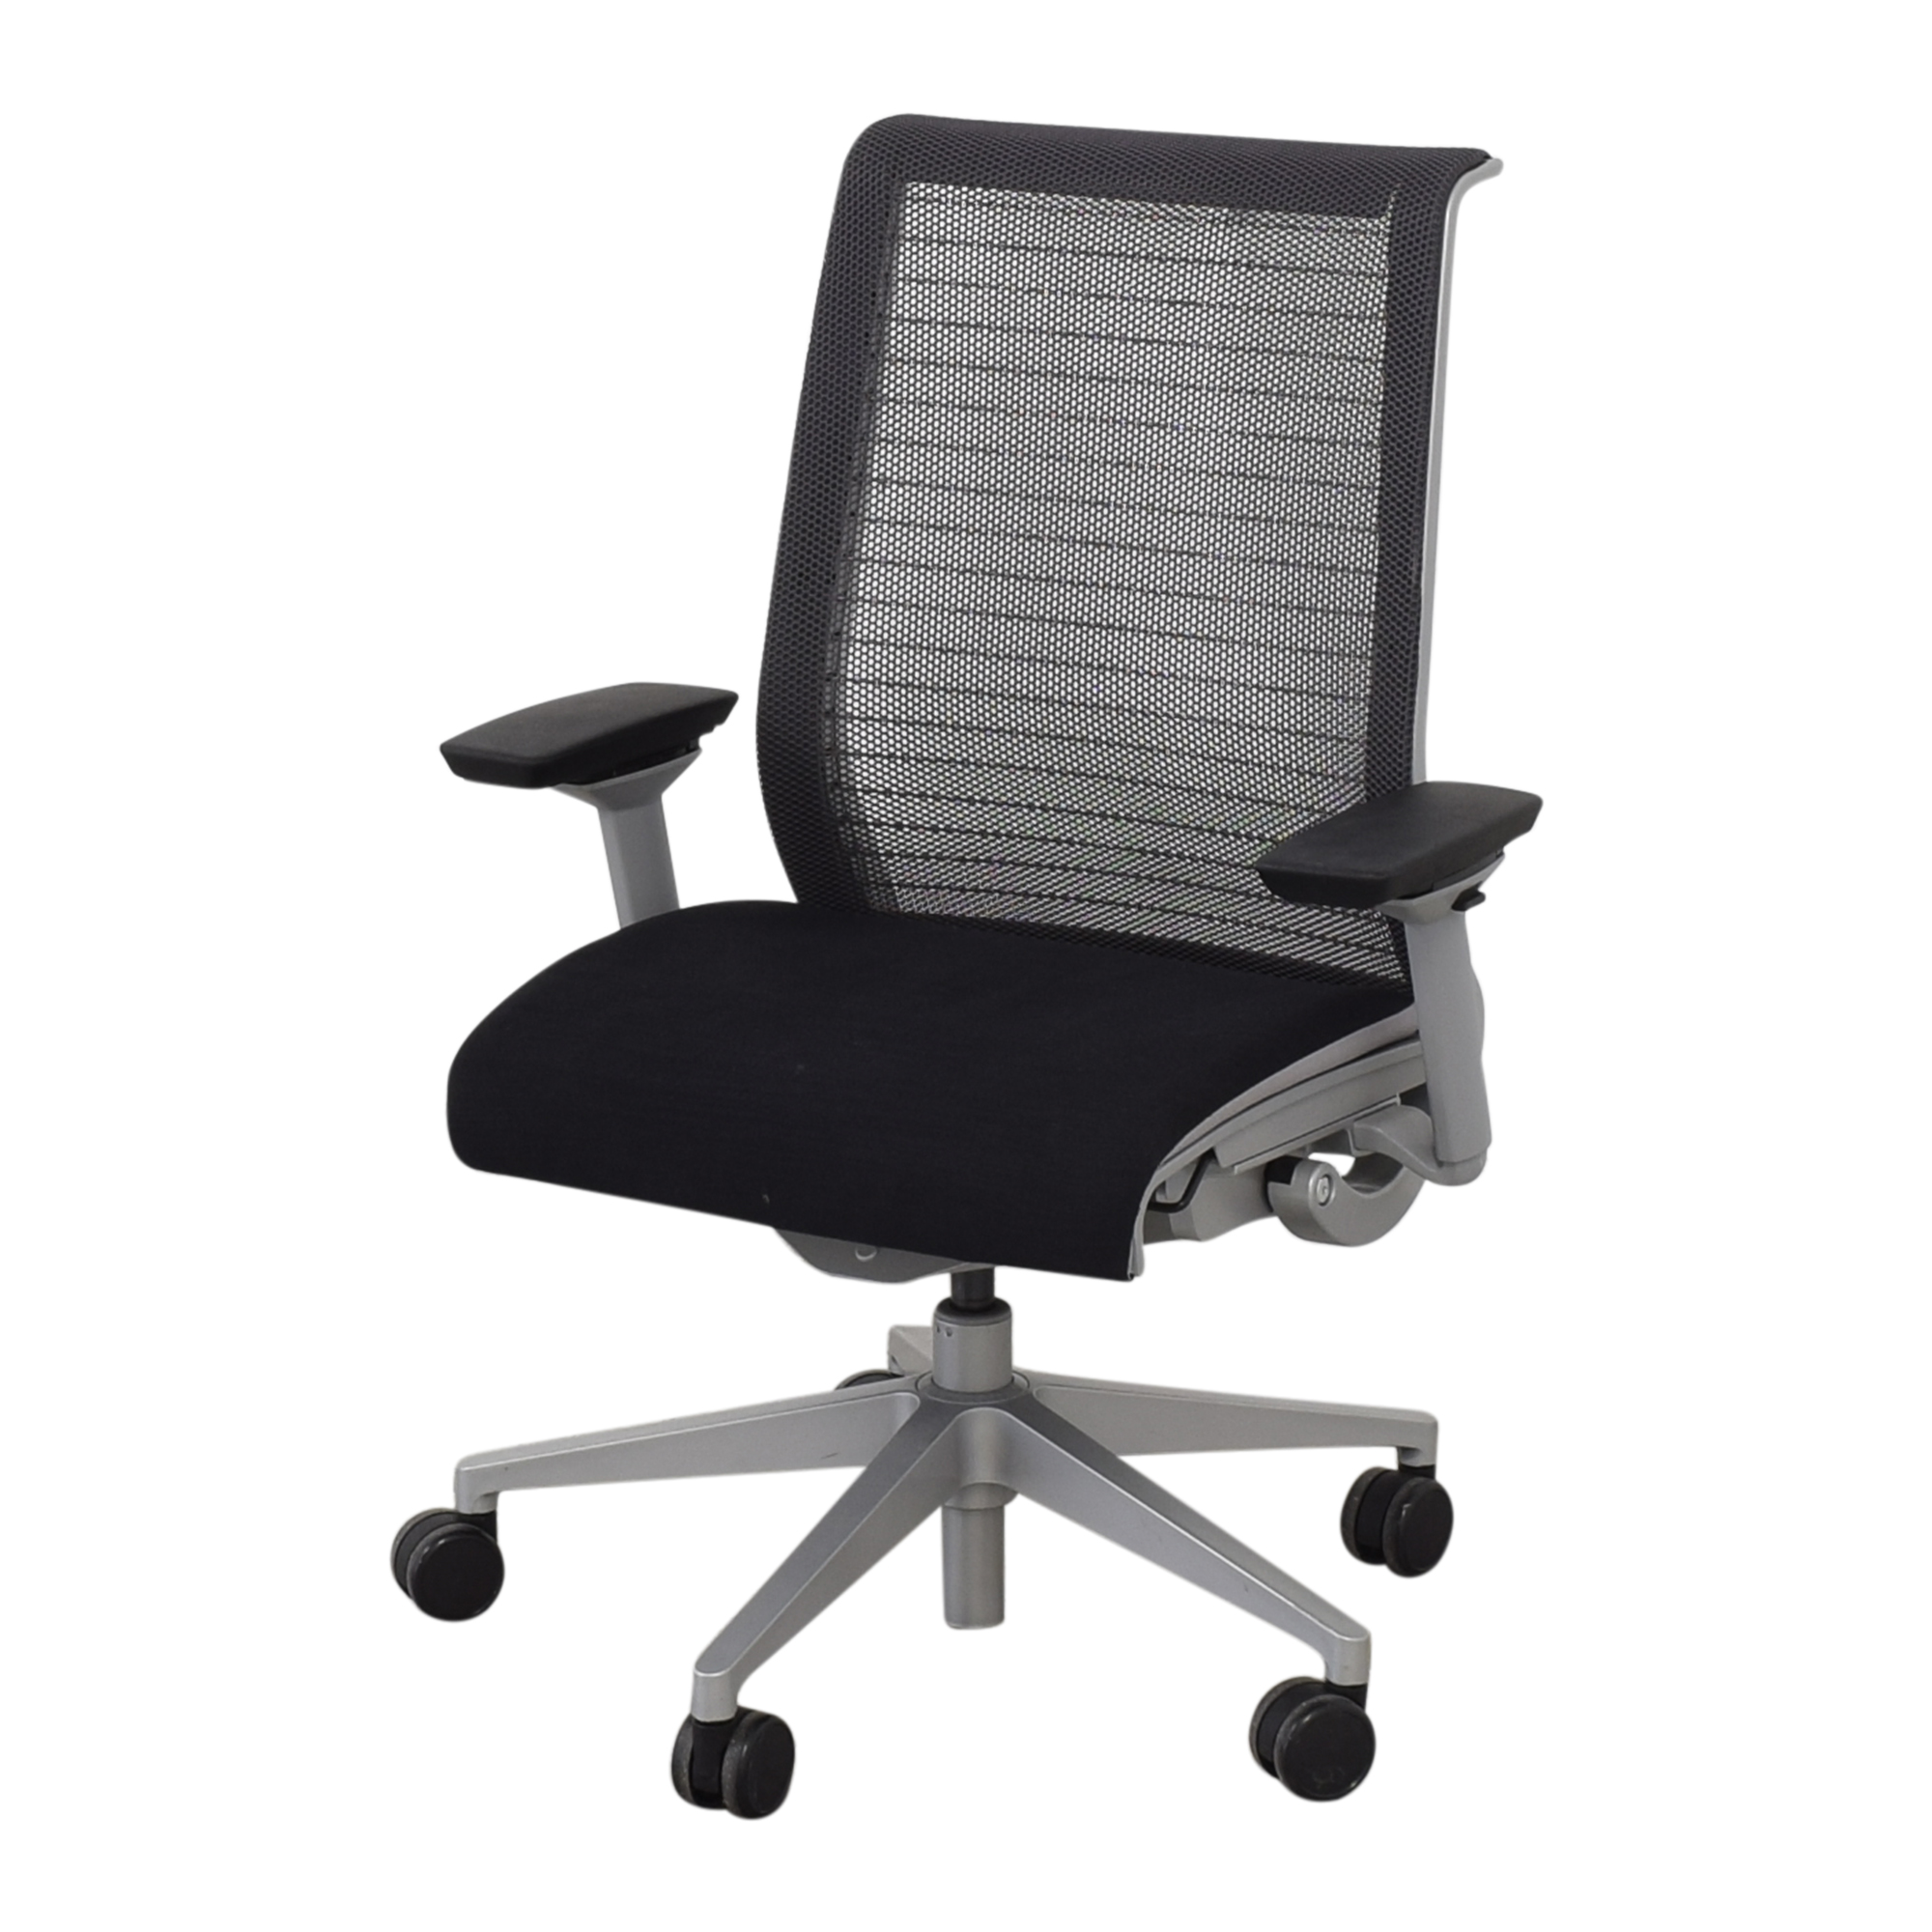 Steelcase Steelcase Cobi Swivel Chair nj